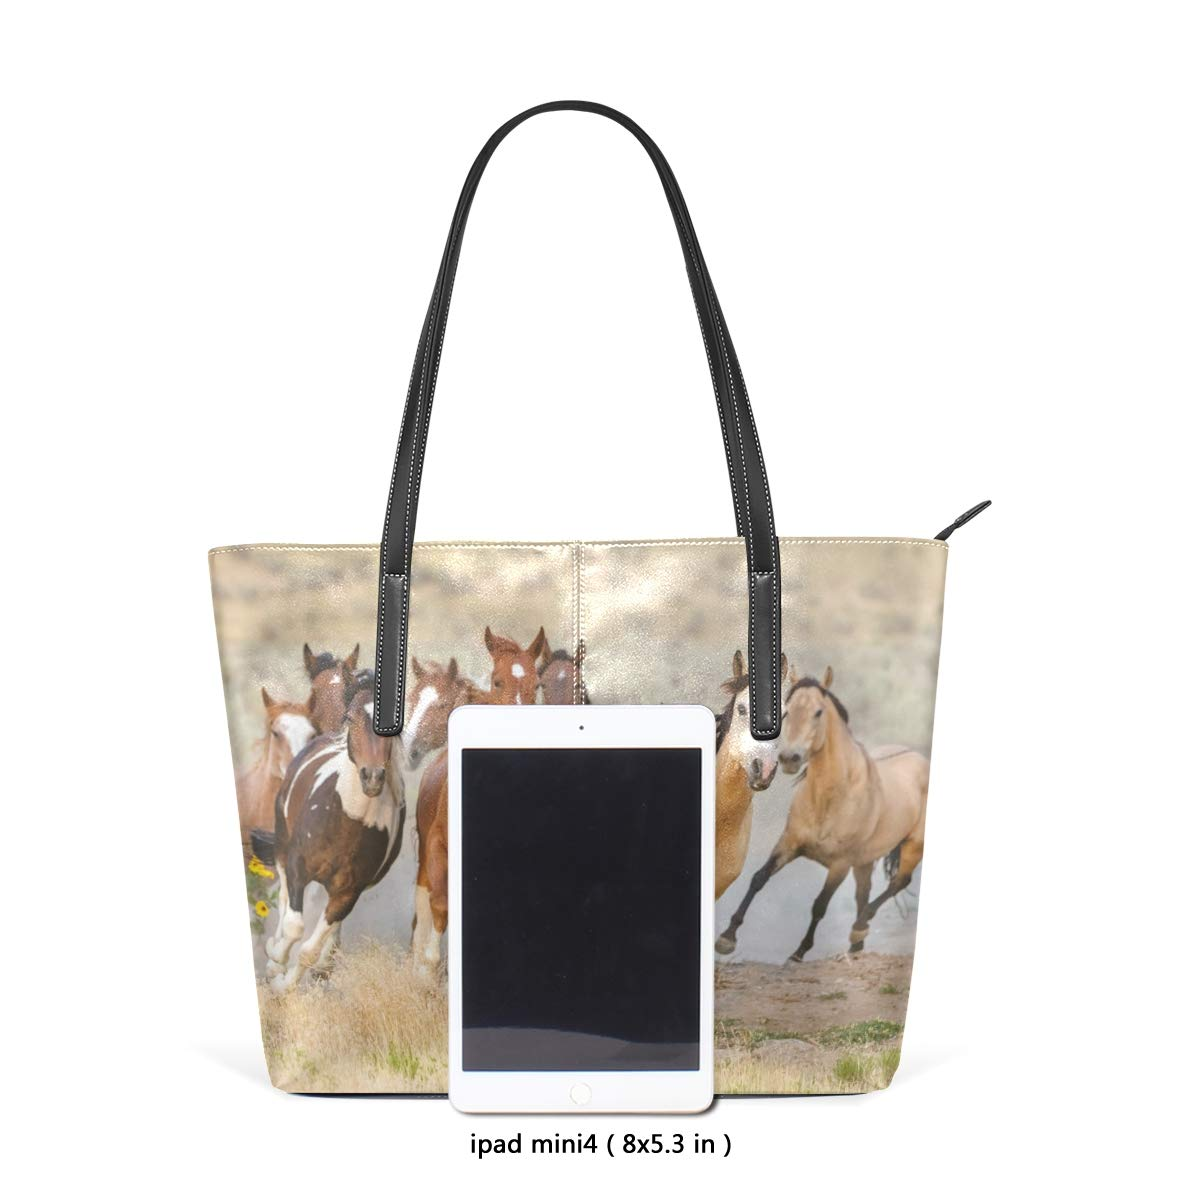 c56b1057e7a Amazon.com: Dragon Sword Running Horses Women's PU Leather Fashion ...